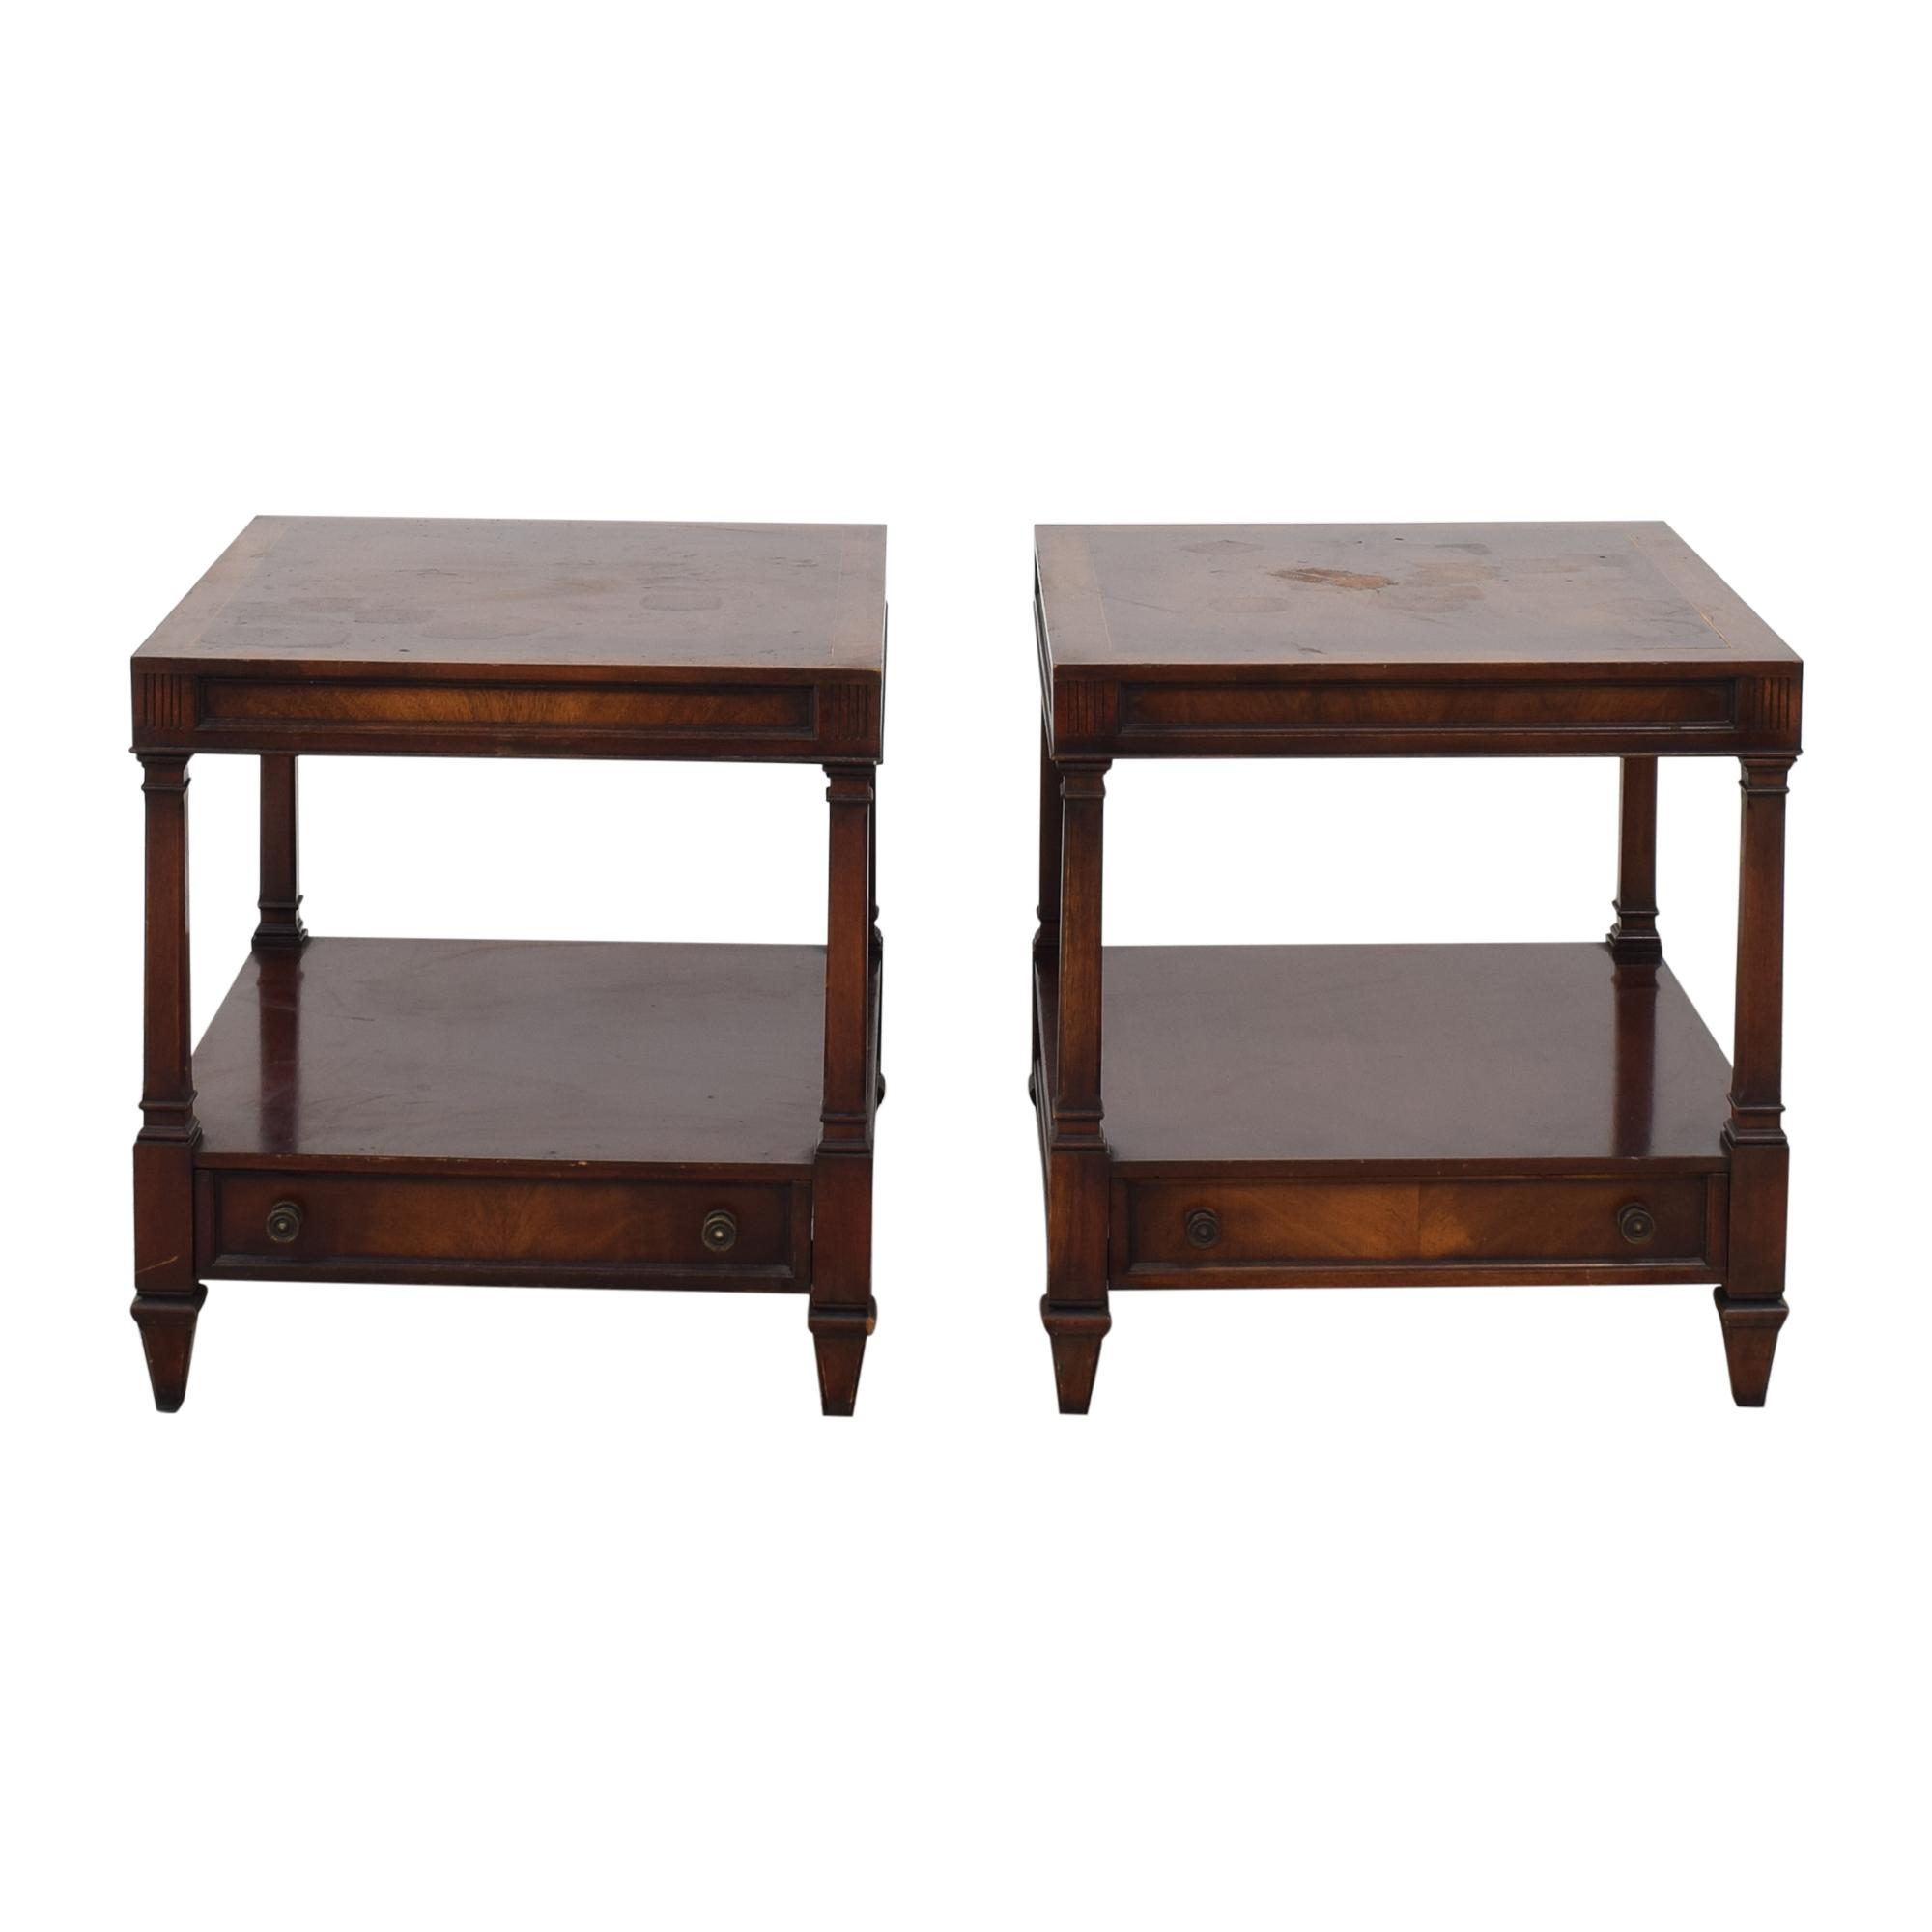 Weiman Weiman Heirloom Collection End Tables discount